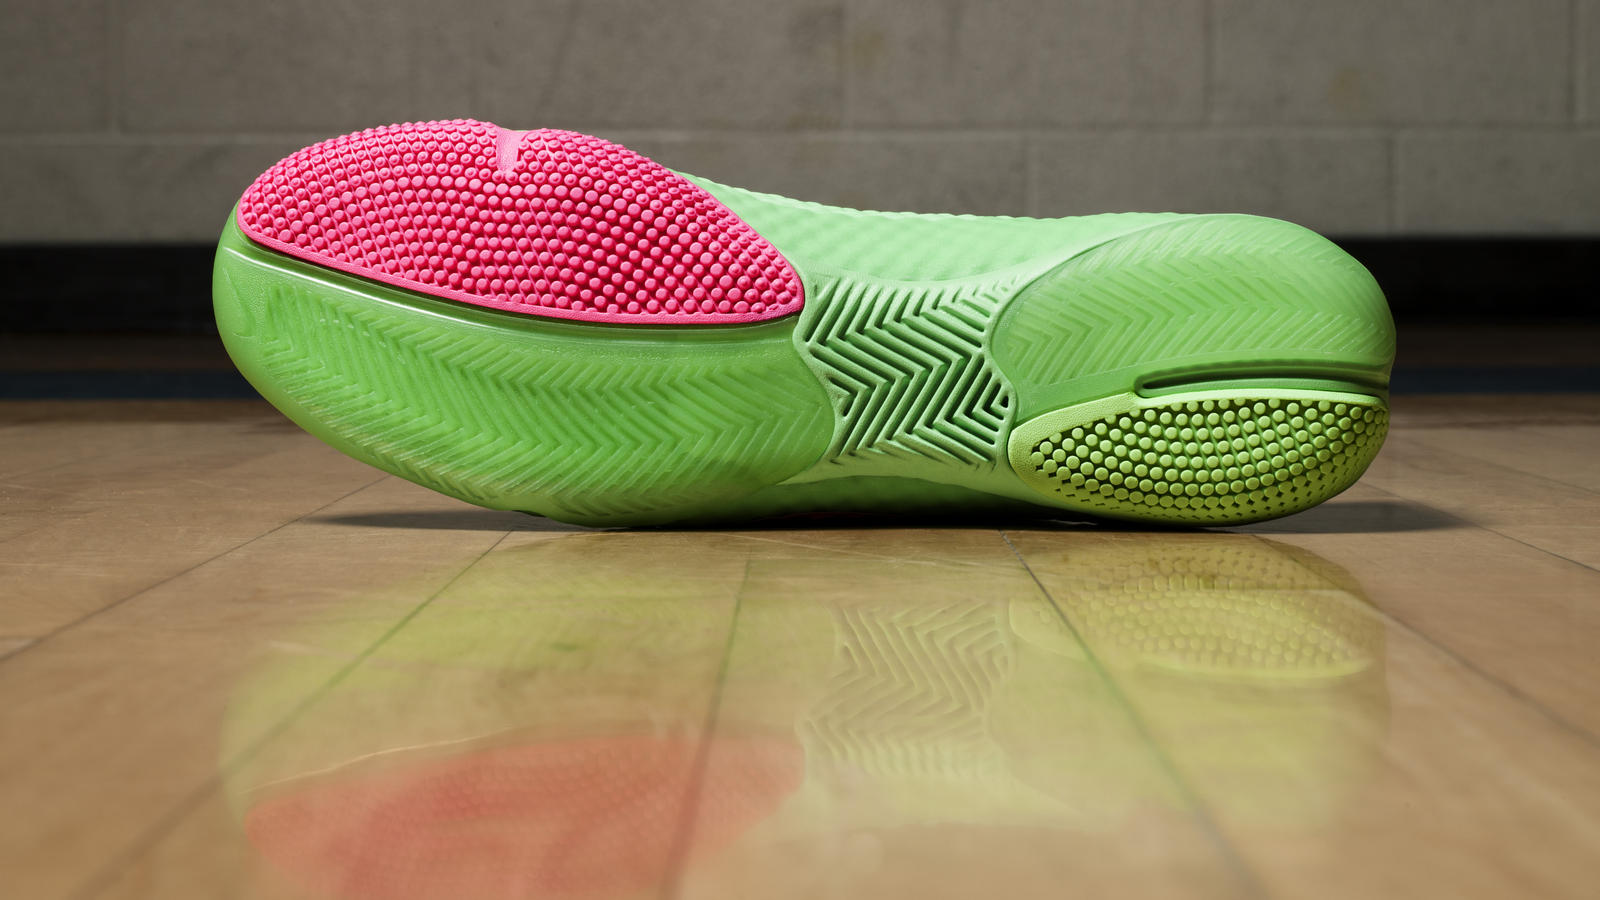 Nike Elastico Finale Ii Outsole